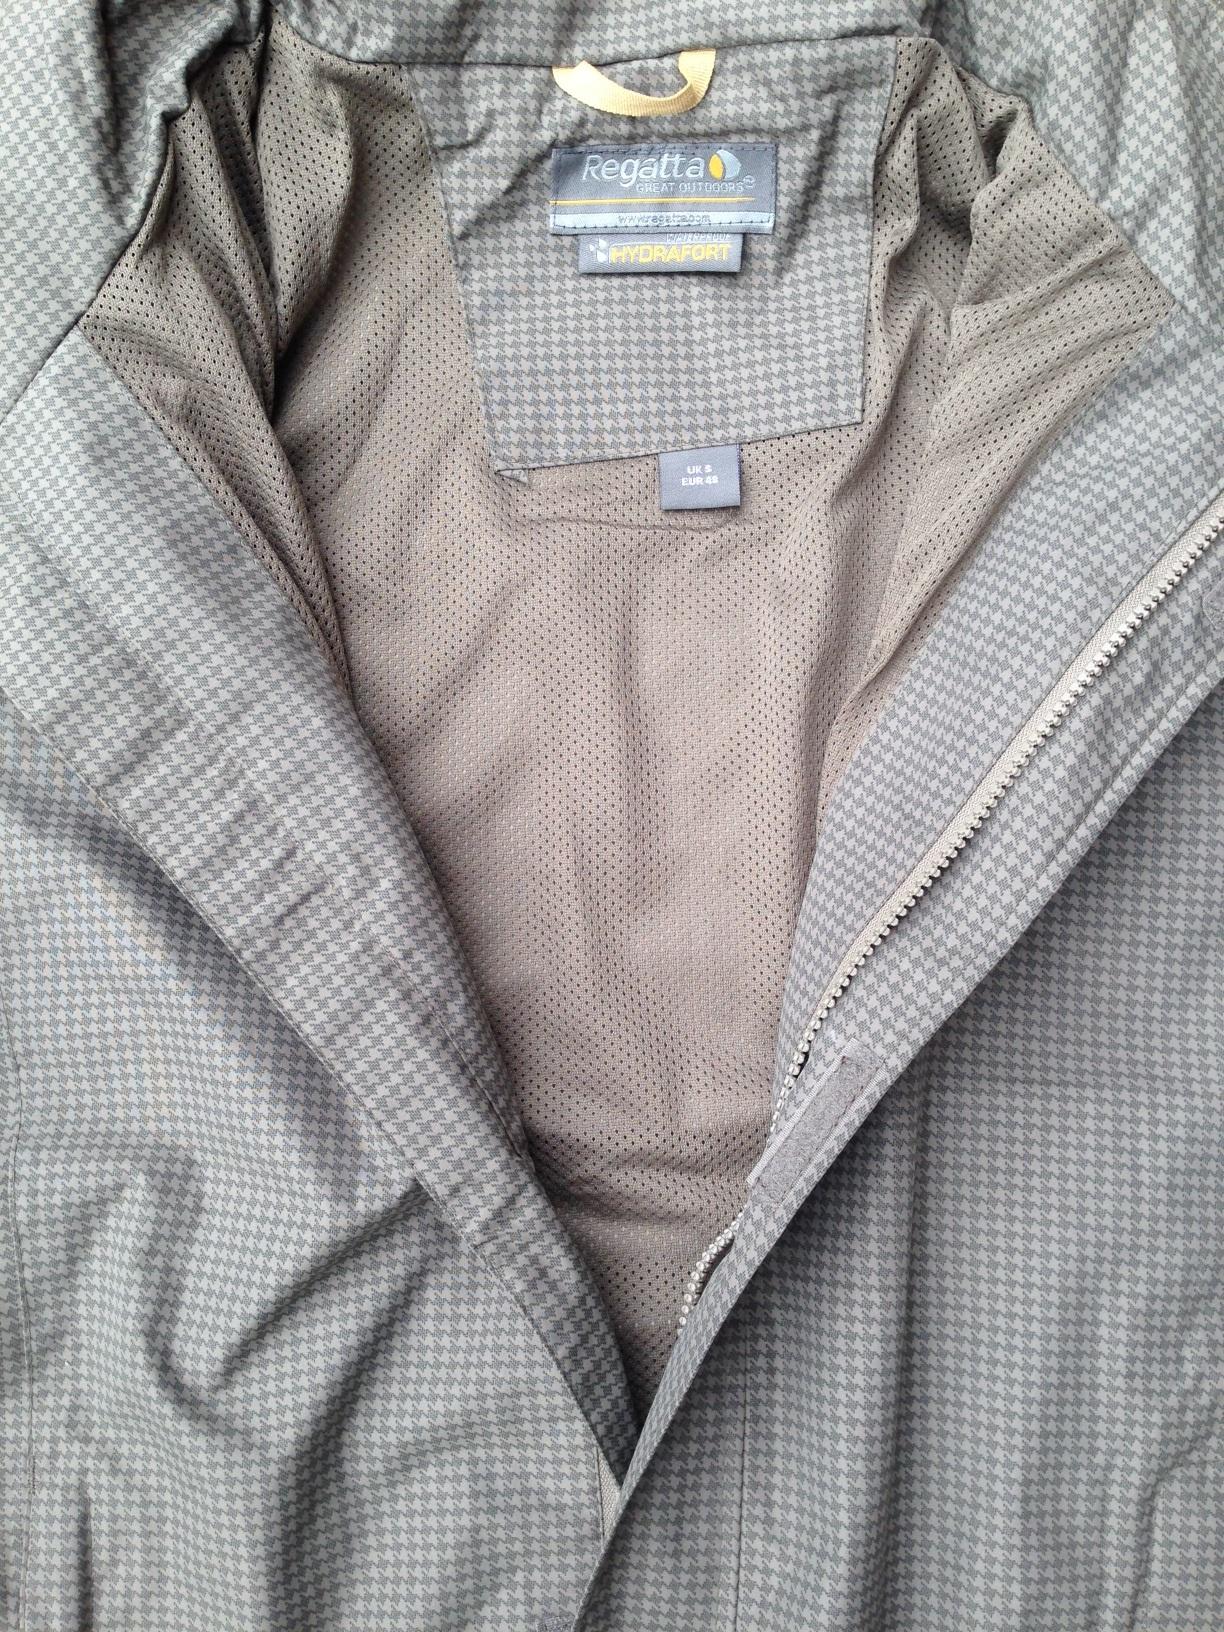 Mens-Regatta-Dare2b-Lightweight-Waterproof-Windproof-Jacket-Clearance-RRP-70-00 thumbnail 58